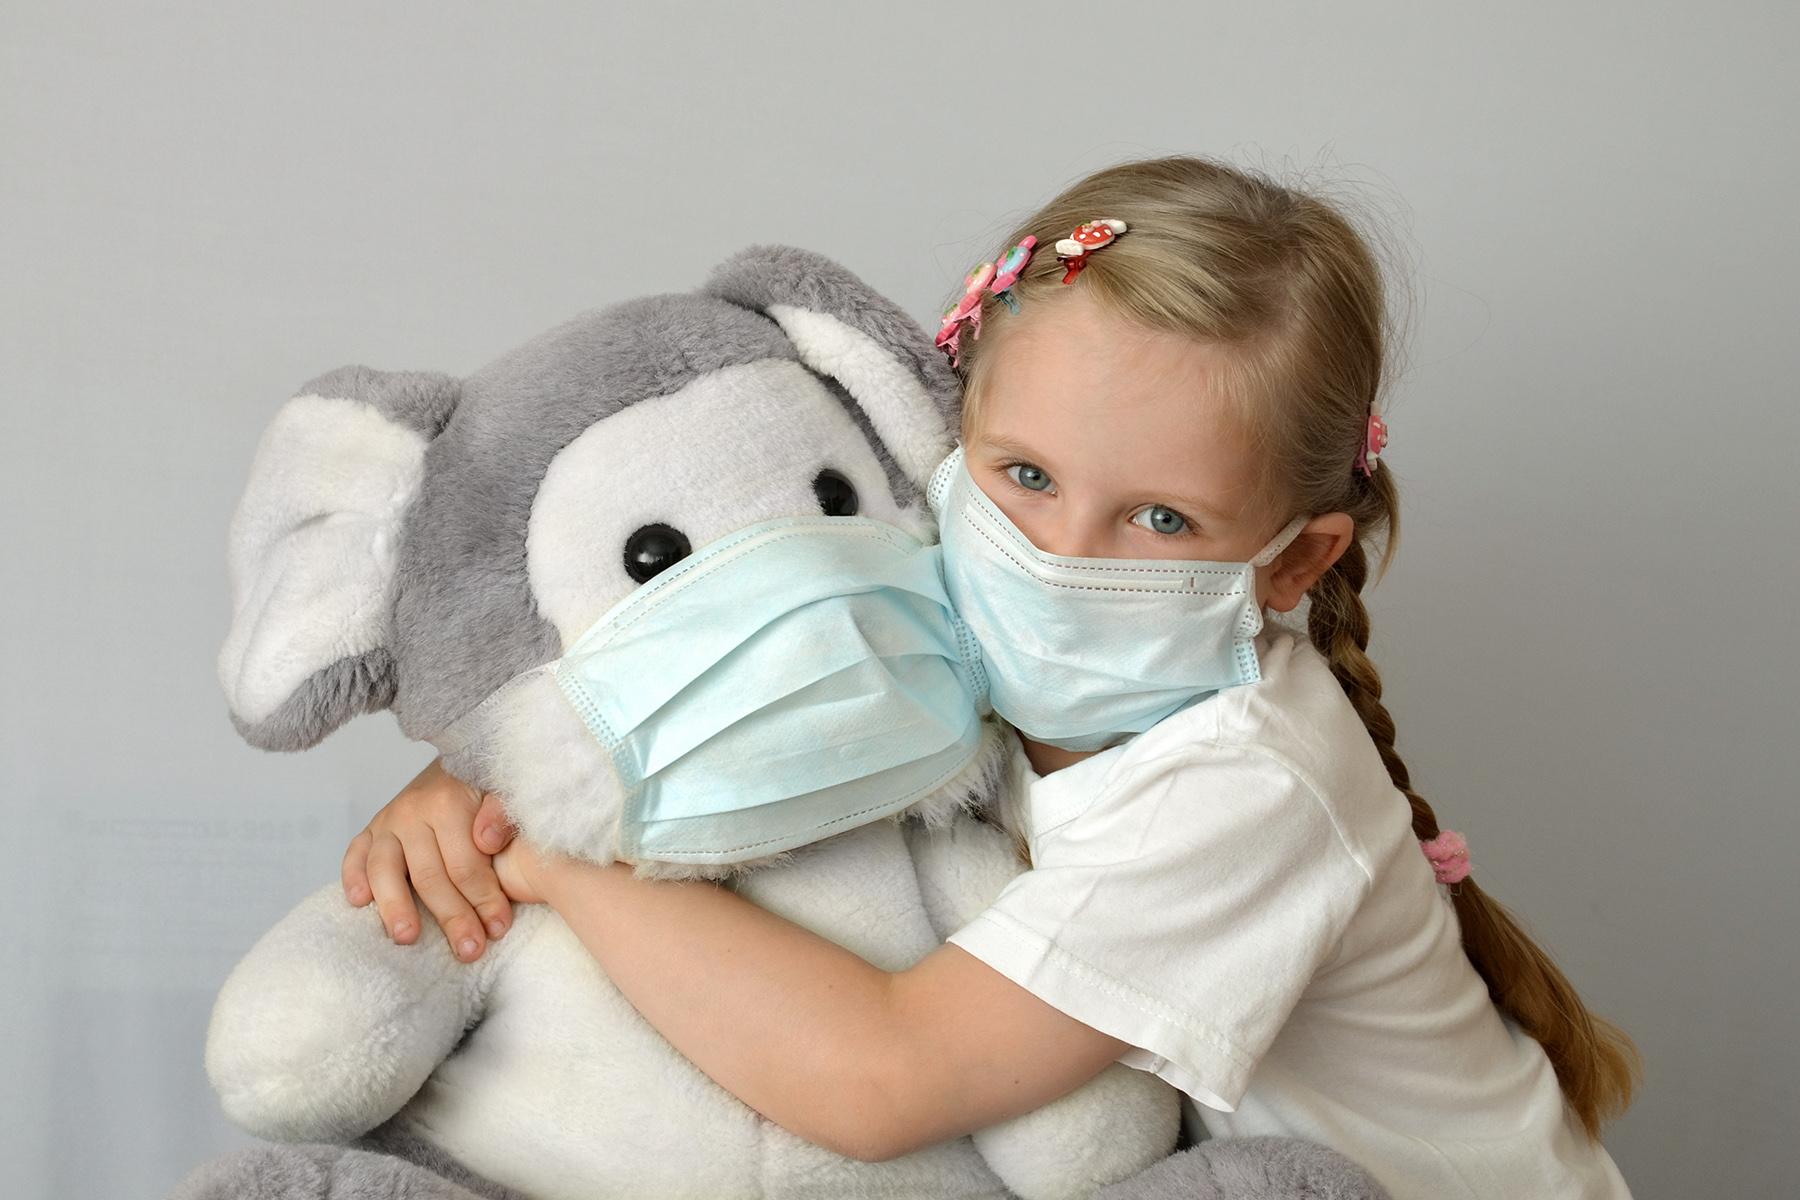 health insurance for children in the Netherlands